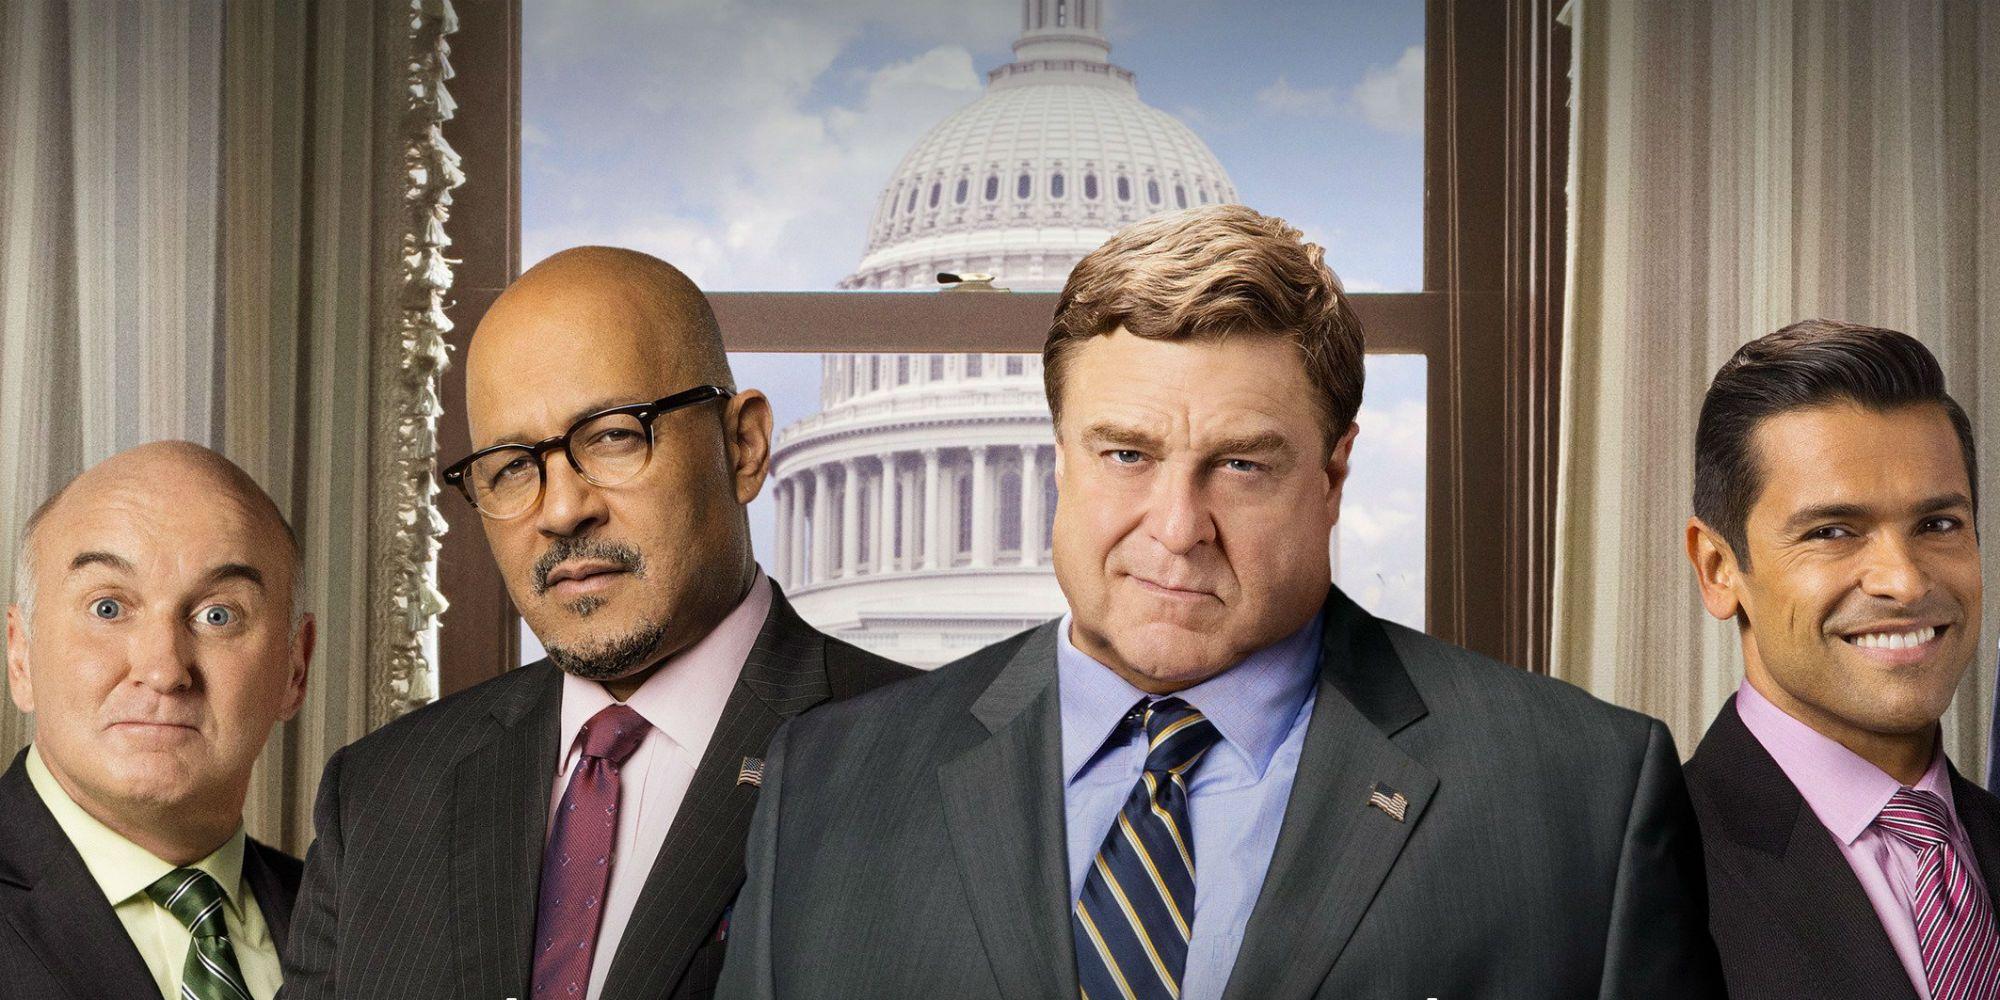 Alpha House 2014 Full Movie why amazon canceled alpha house before season 3   screen rant